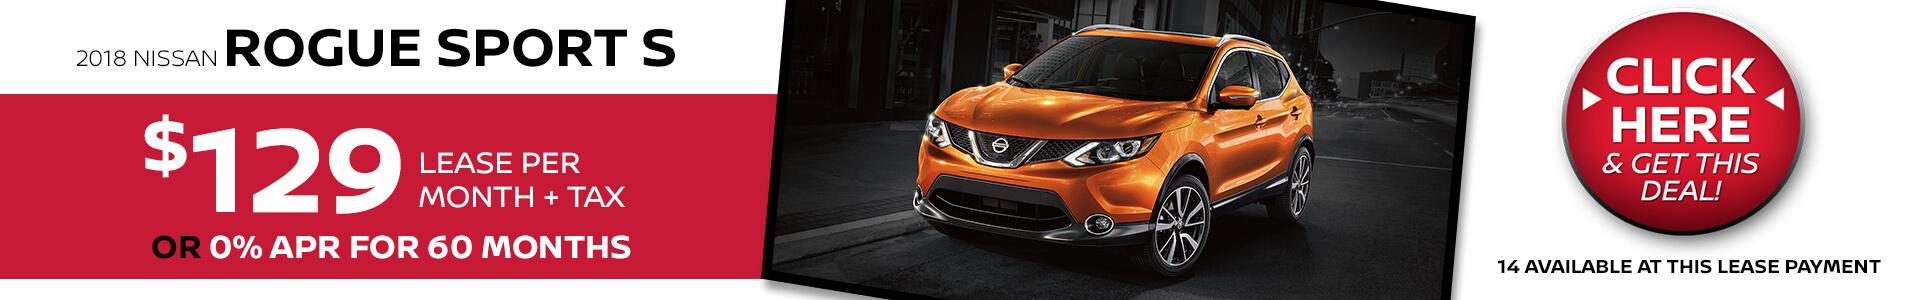 Nissan Rogue Sport $129 Lease